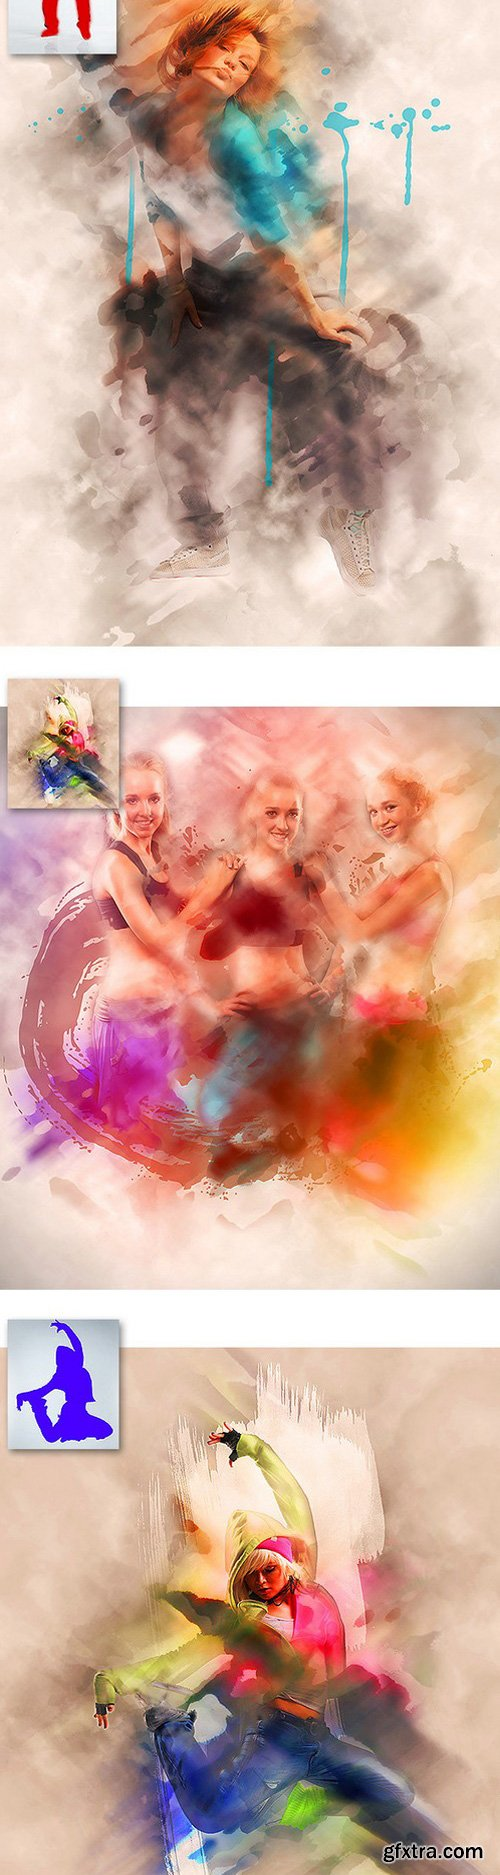 GraphicRiver - 12058178 Modernart Photoshop Action Vol1